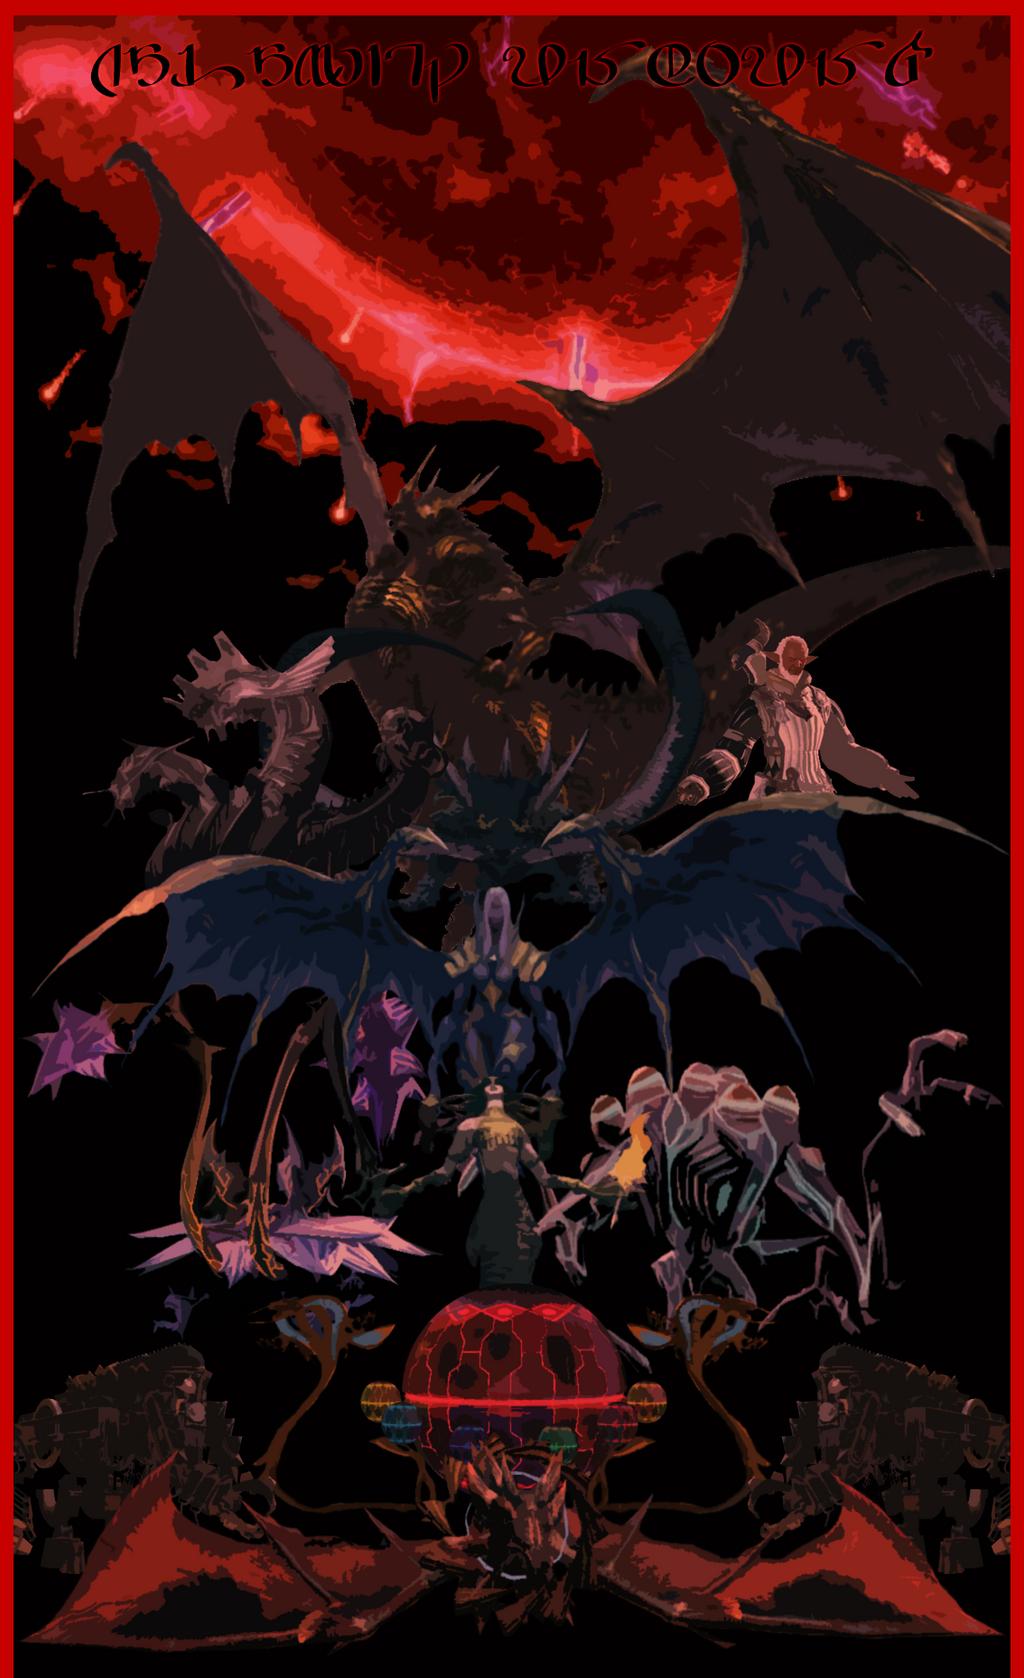 Final Fantasy XIV Calamity Unbound By DanteAllaghieri